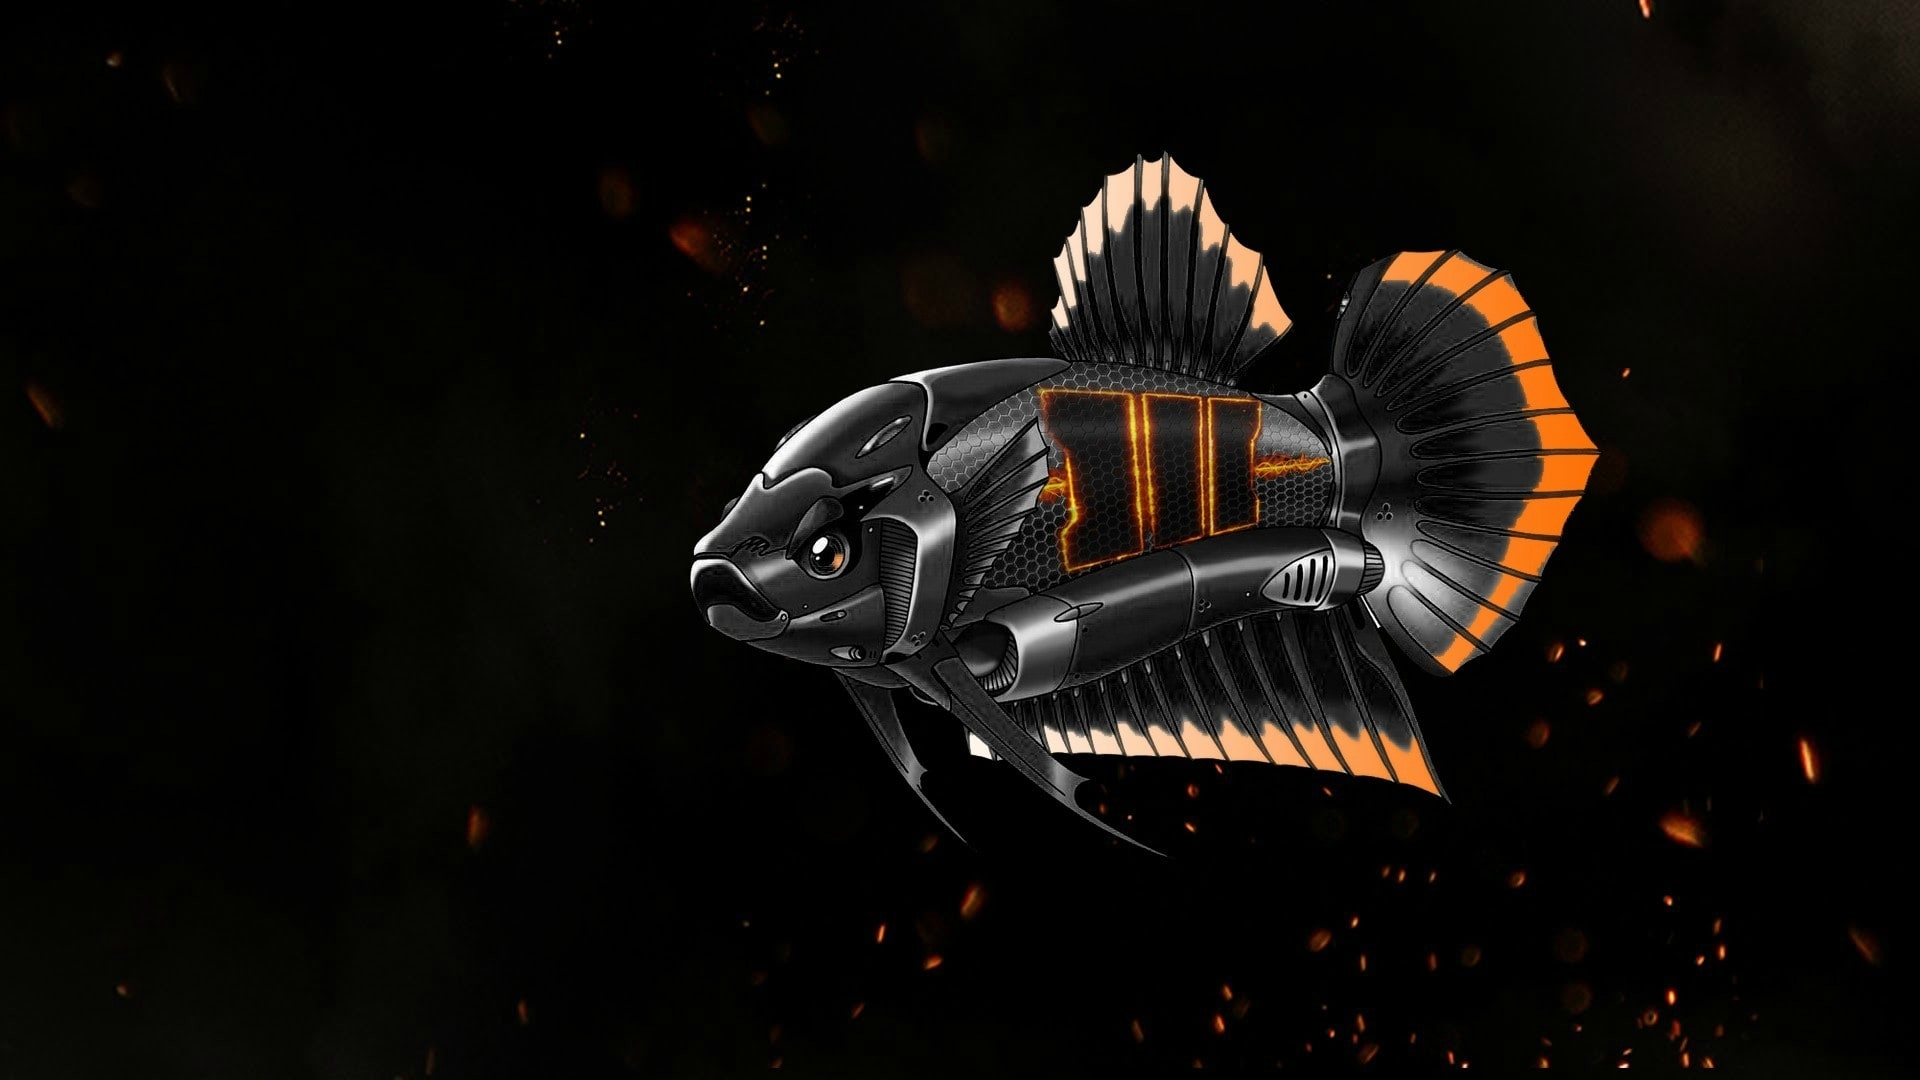 Call Of Duty Black Ops 3 Hd Desktop Wallpapers 7wallpapers 89uj